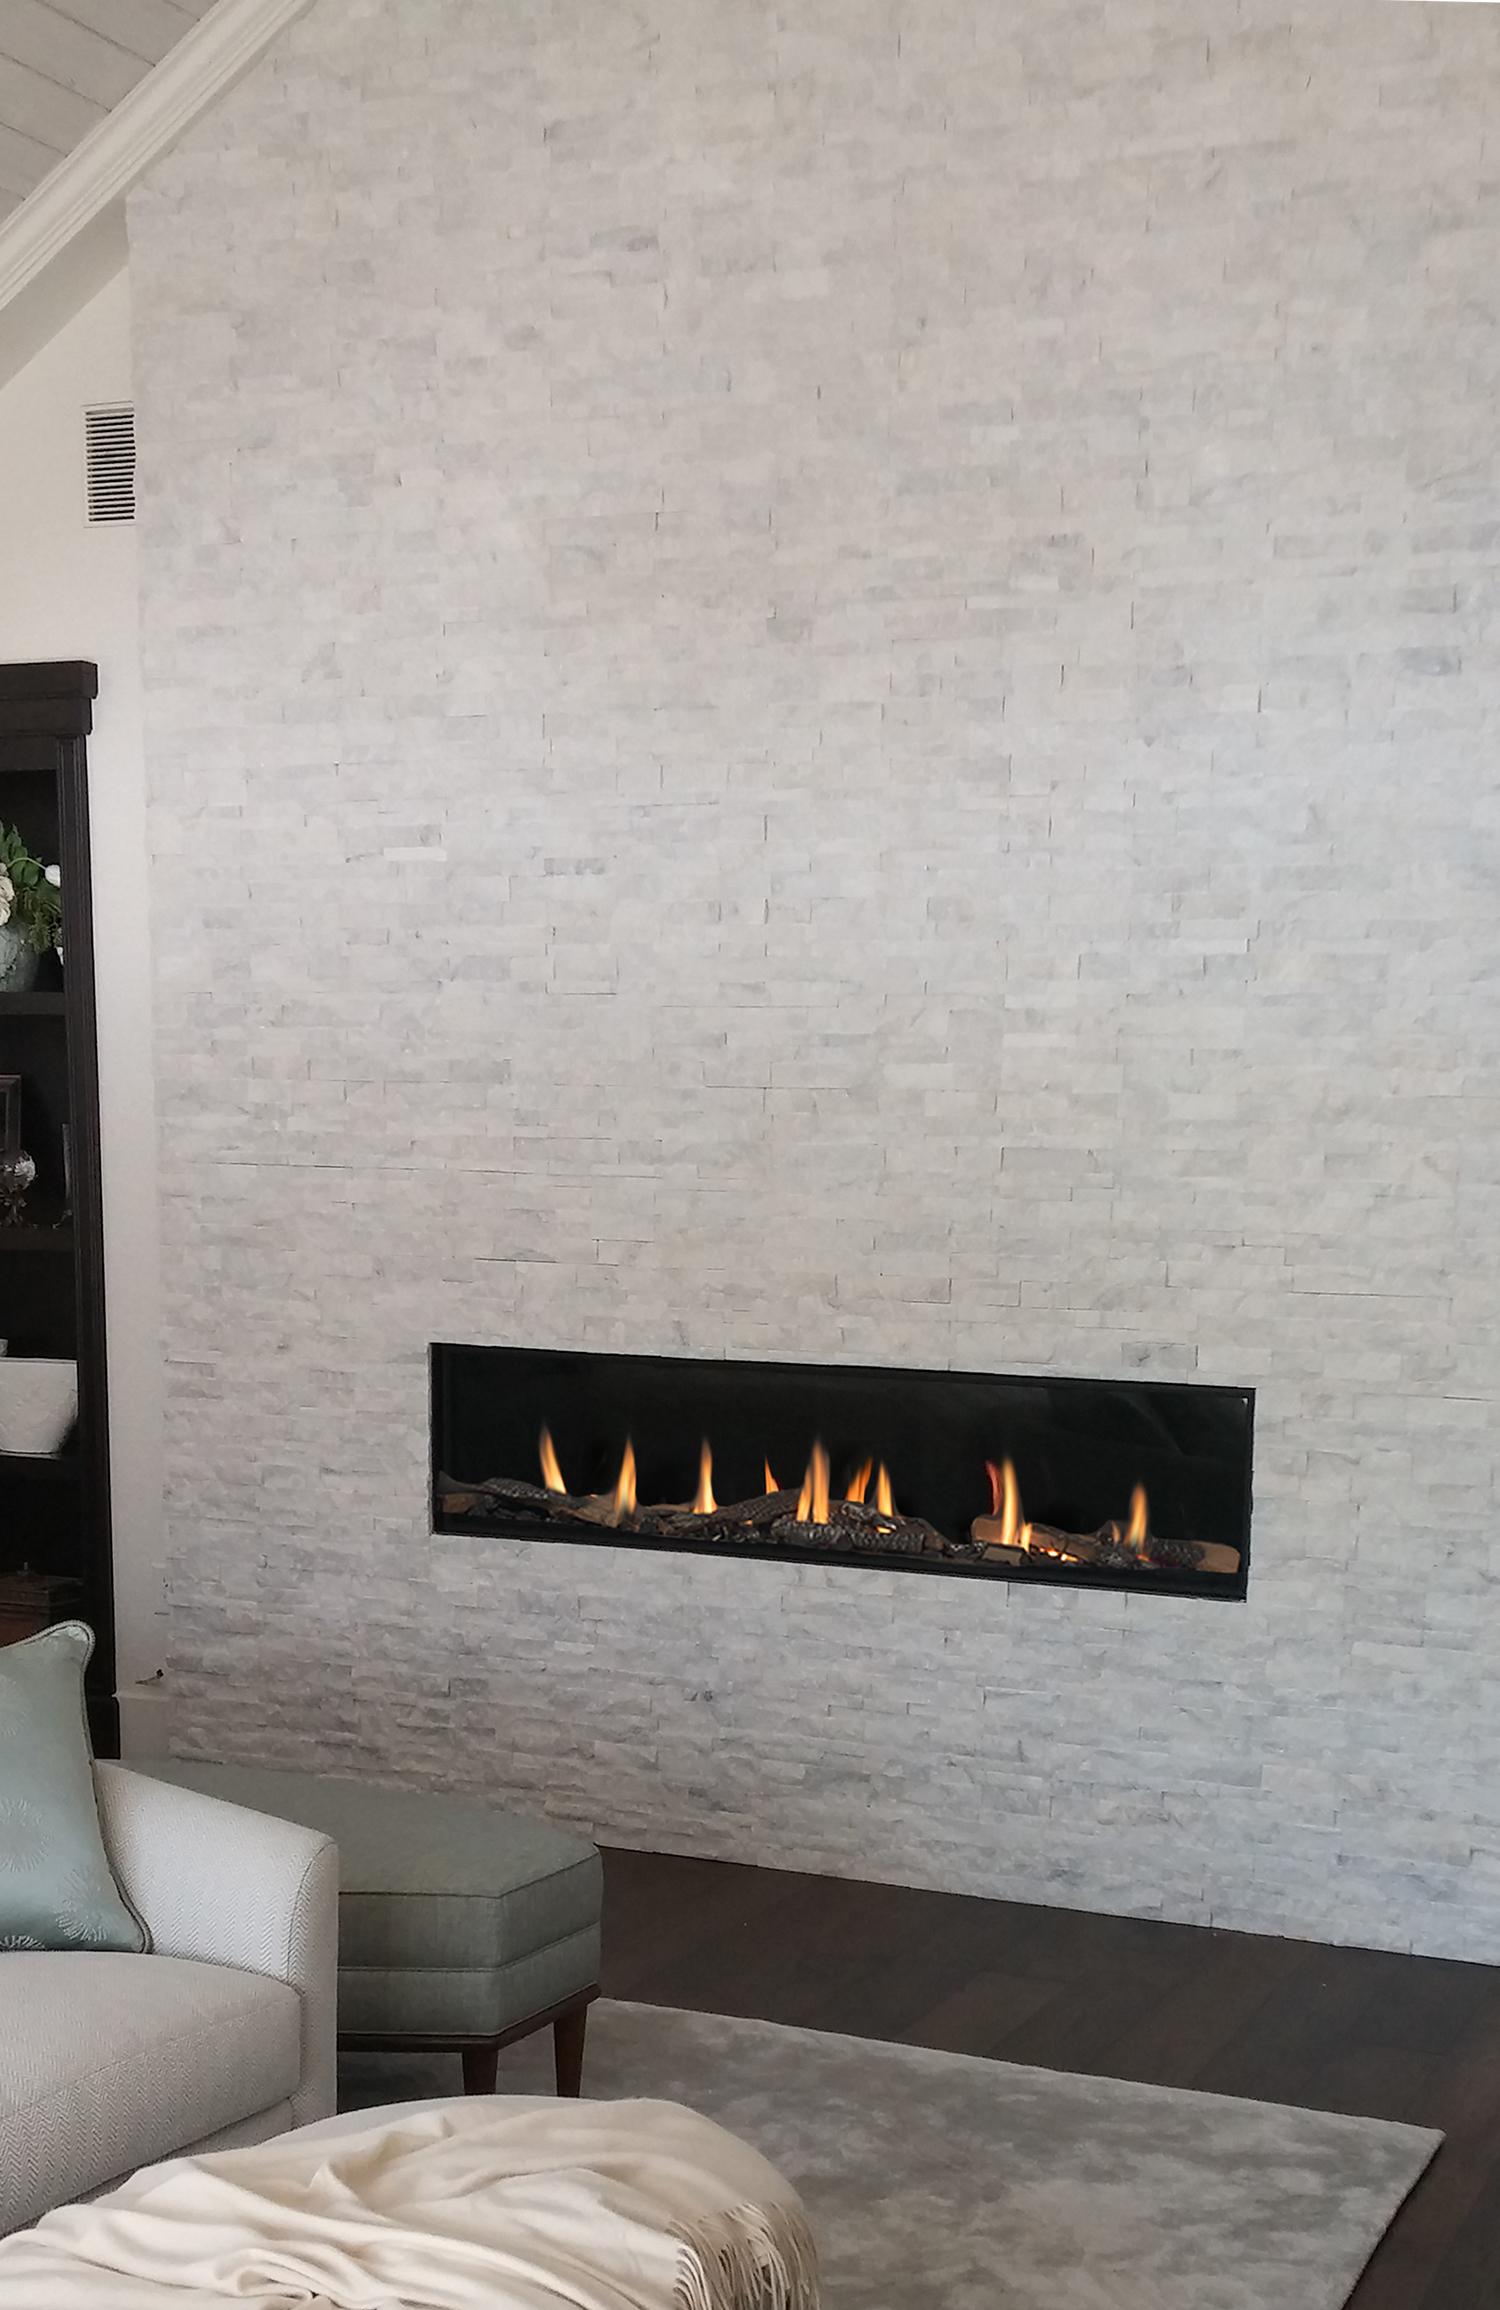 European Home Fireplace Unique Harmonyhealth Edited2 European Home